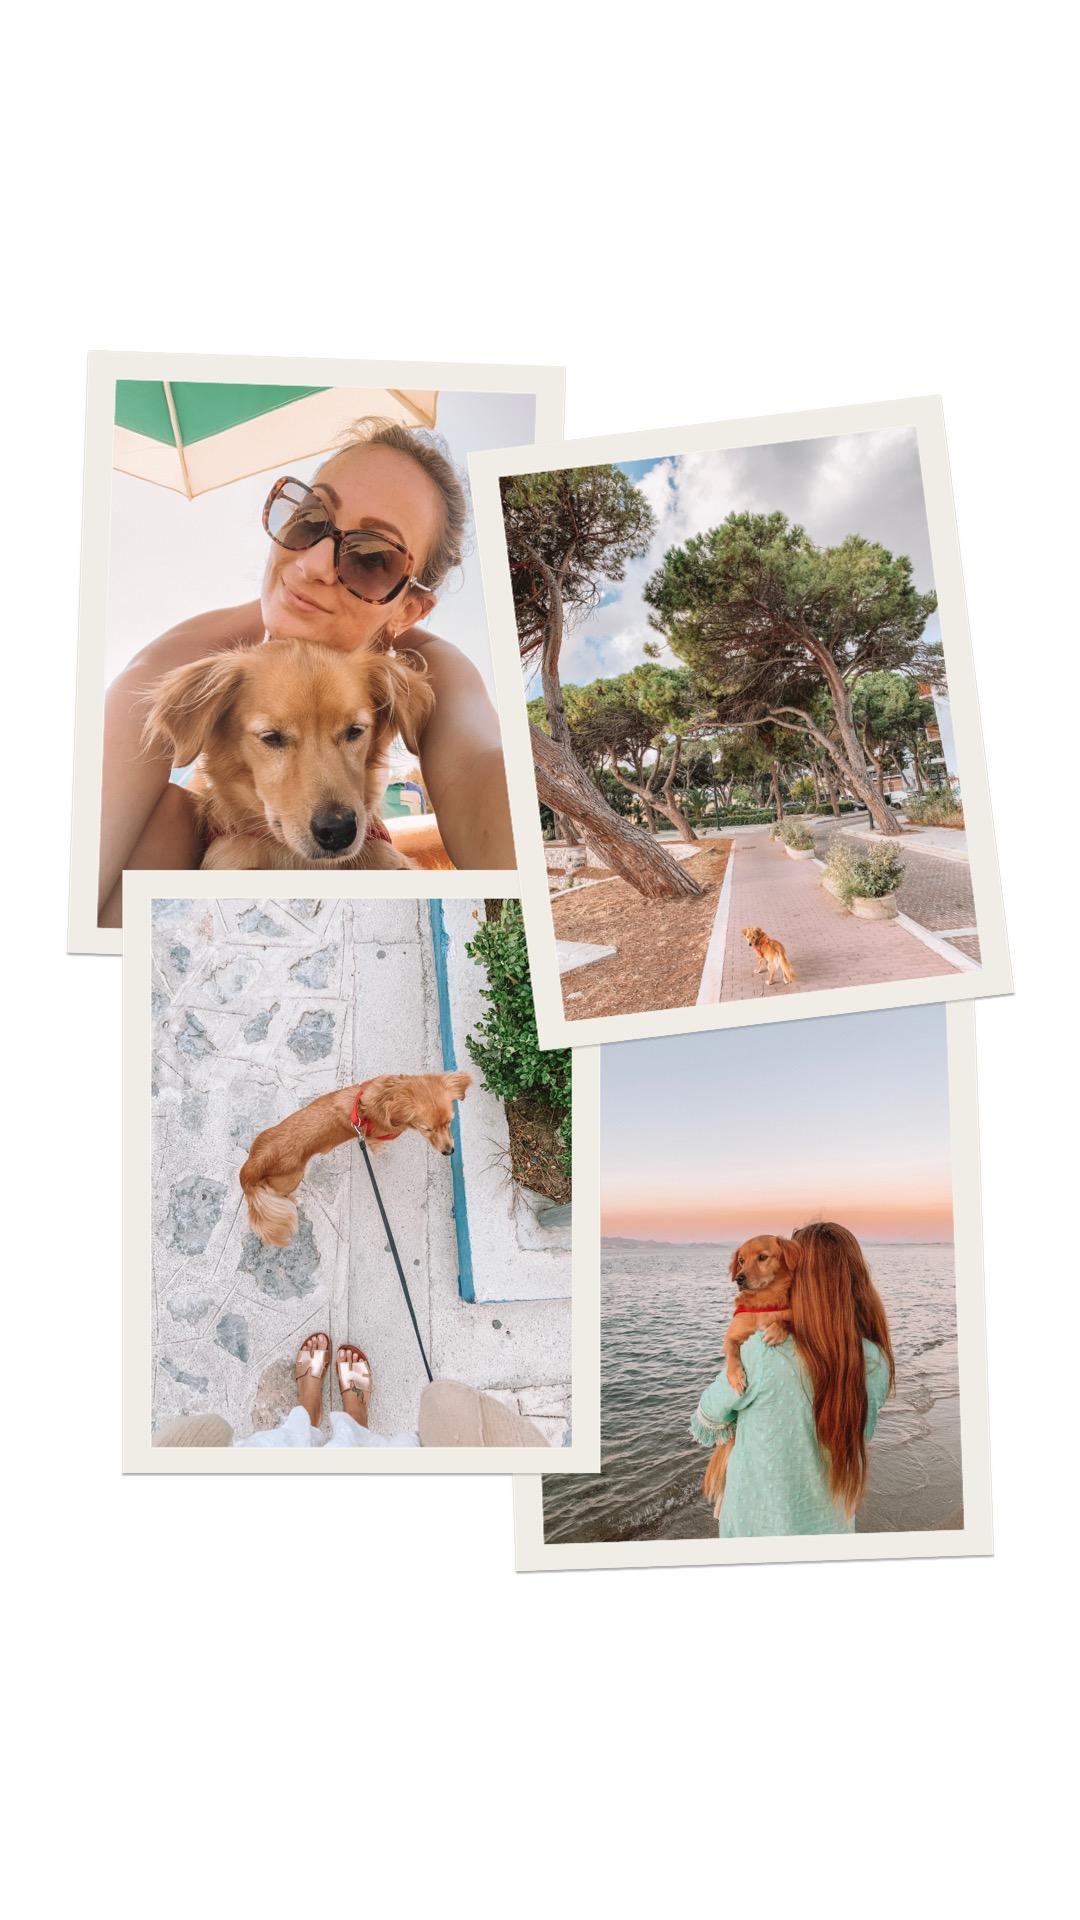 Hond adopteren Griekenland Linda's Wholesome Life